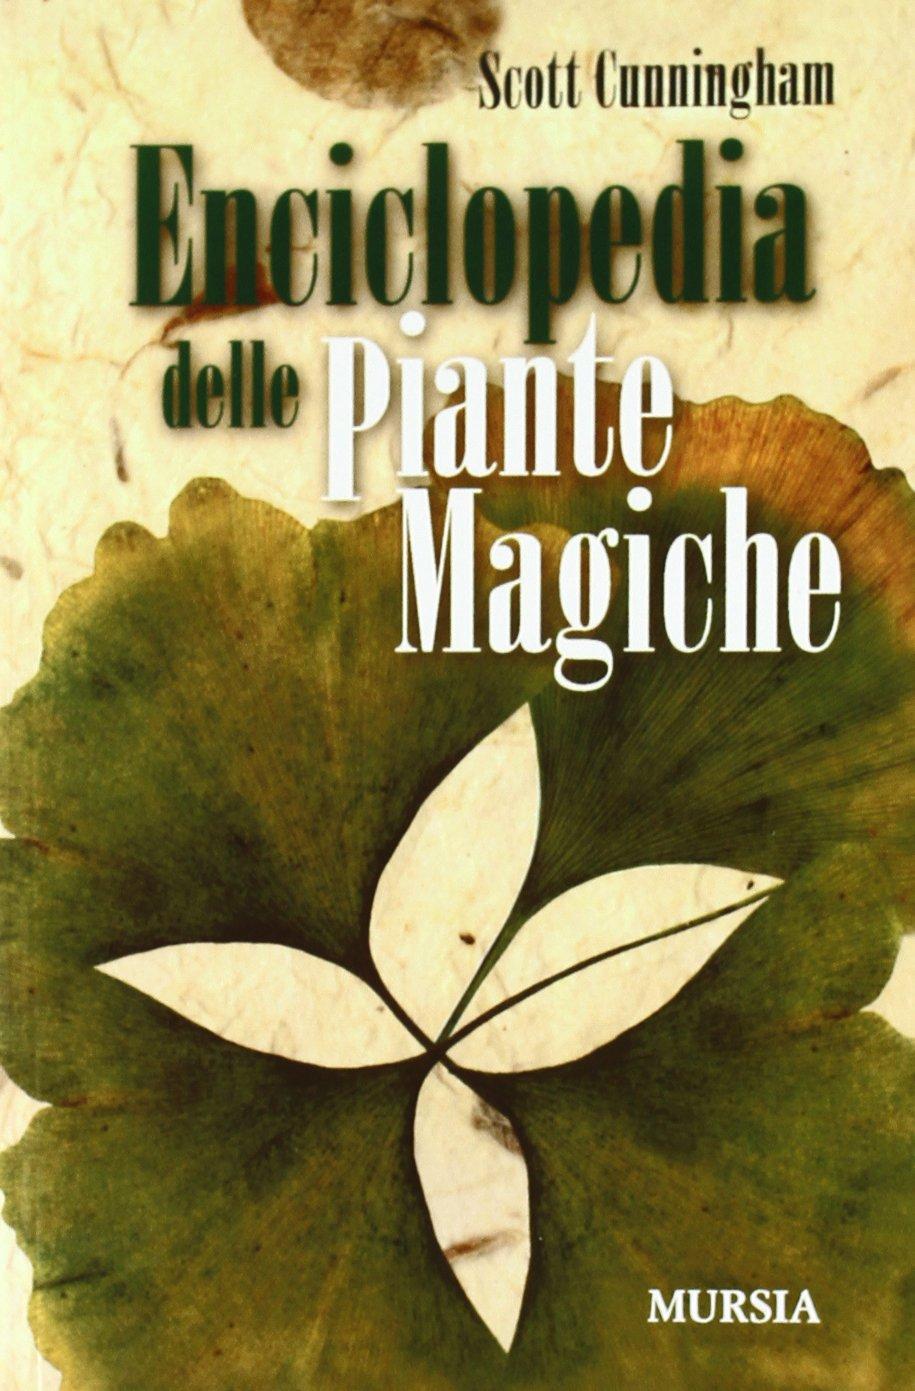 Enciclopedia del piante magiche